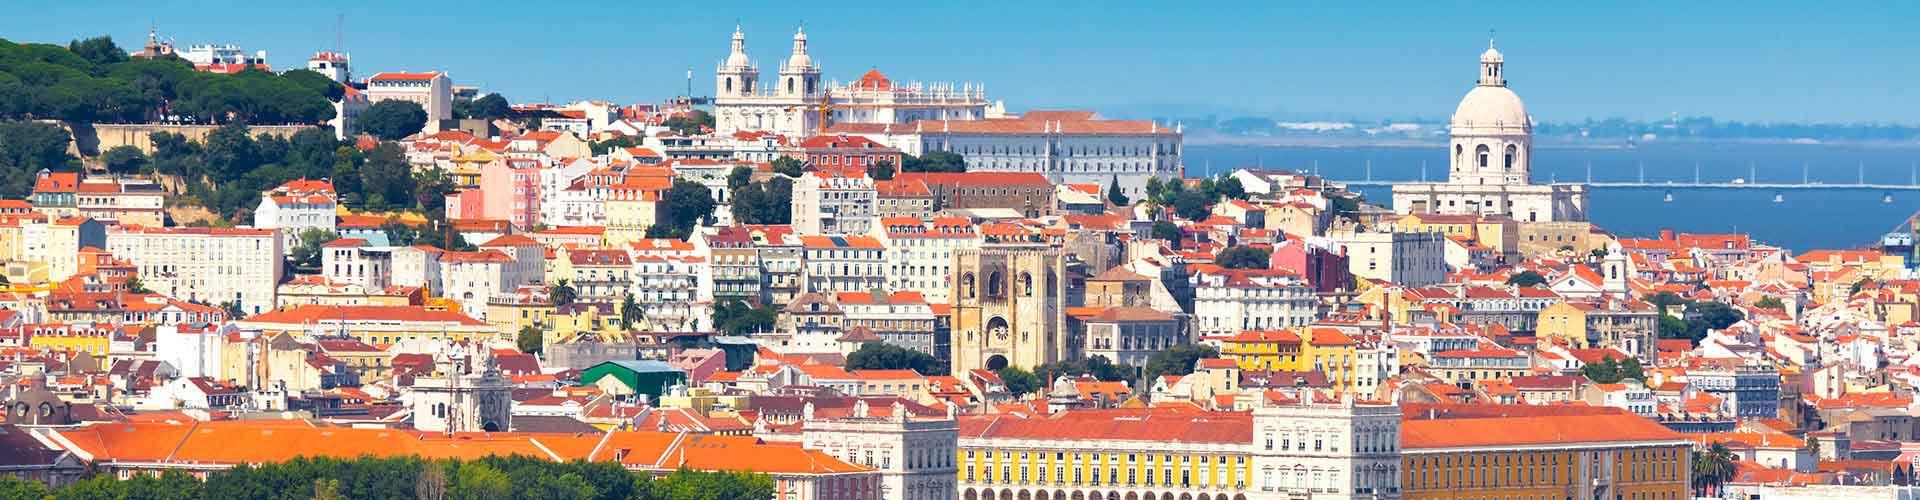 Lisboa - Albergues en Lisboa. Mapas de Lisboa, Fotos y Comentarios para cada Albergue en Lisboa.